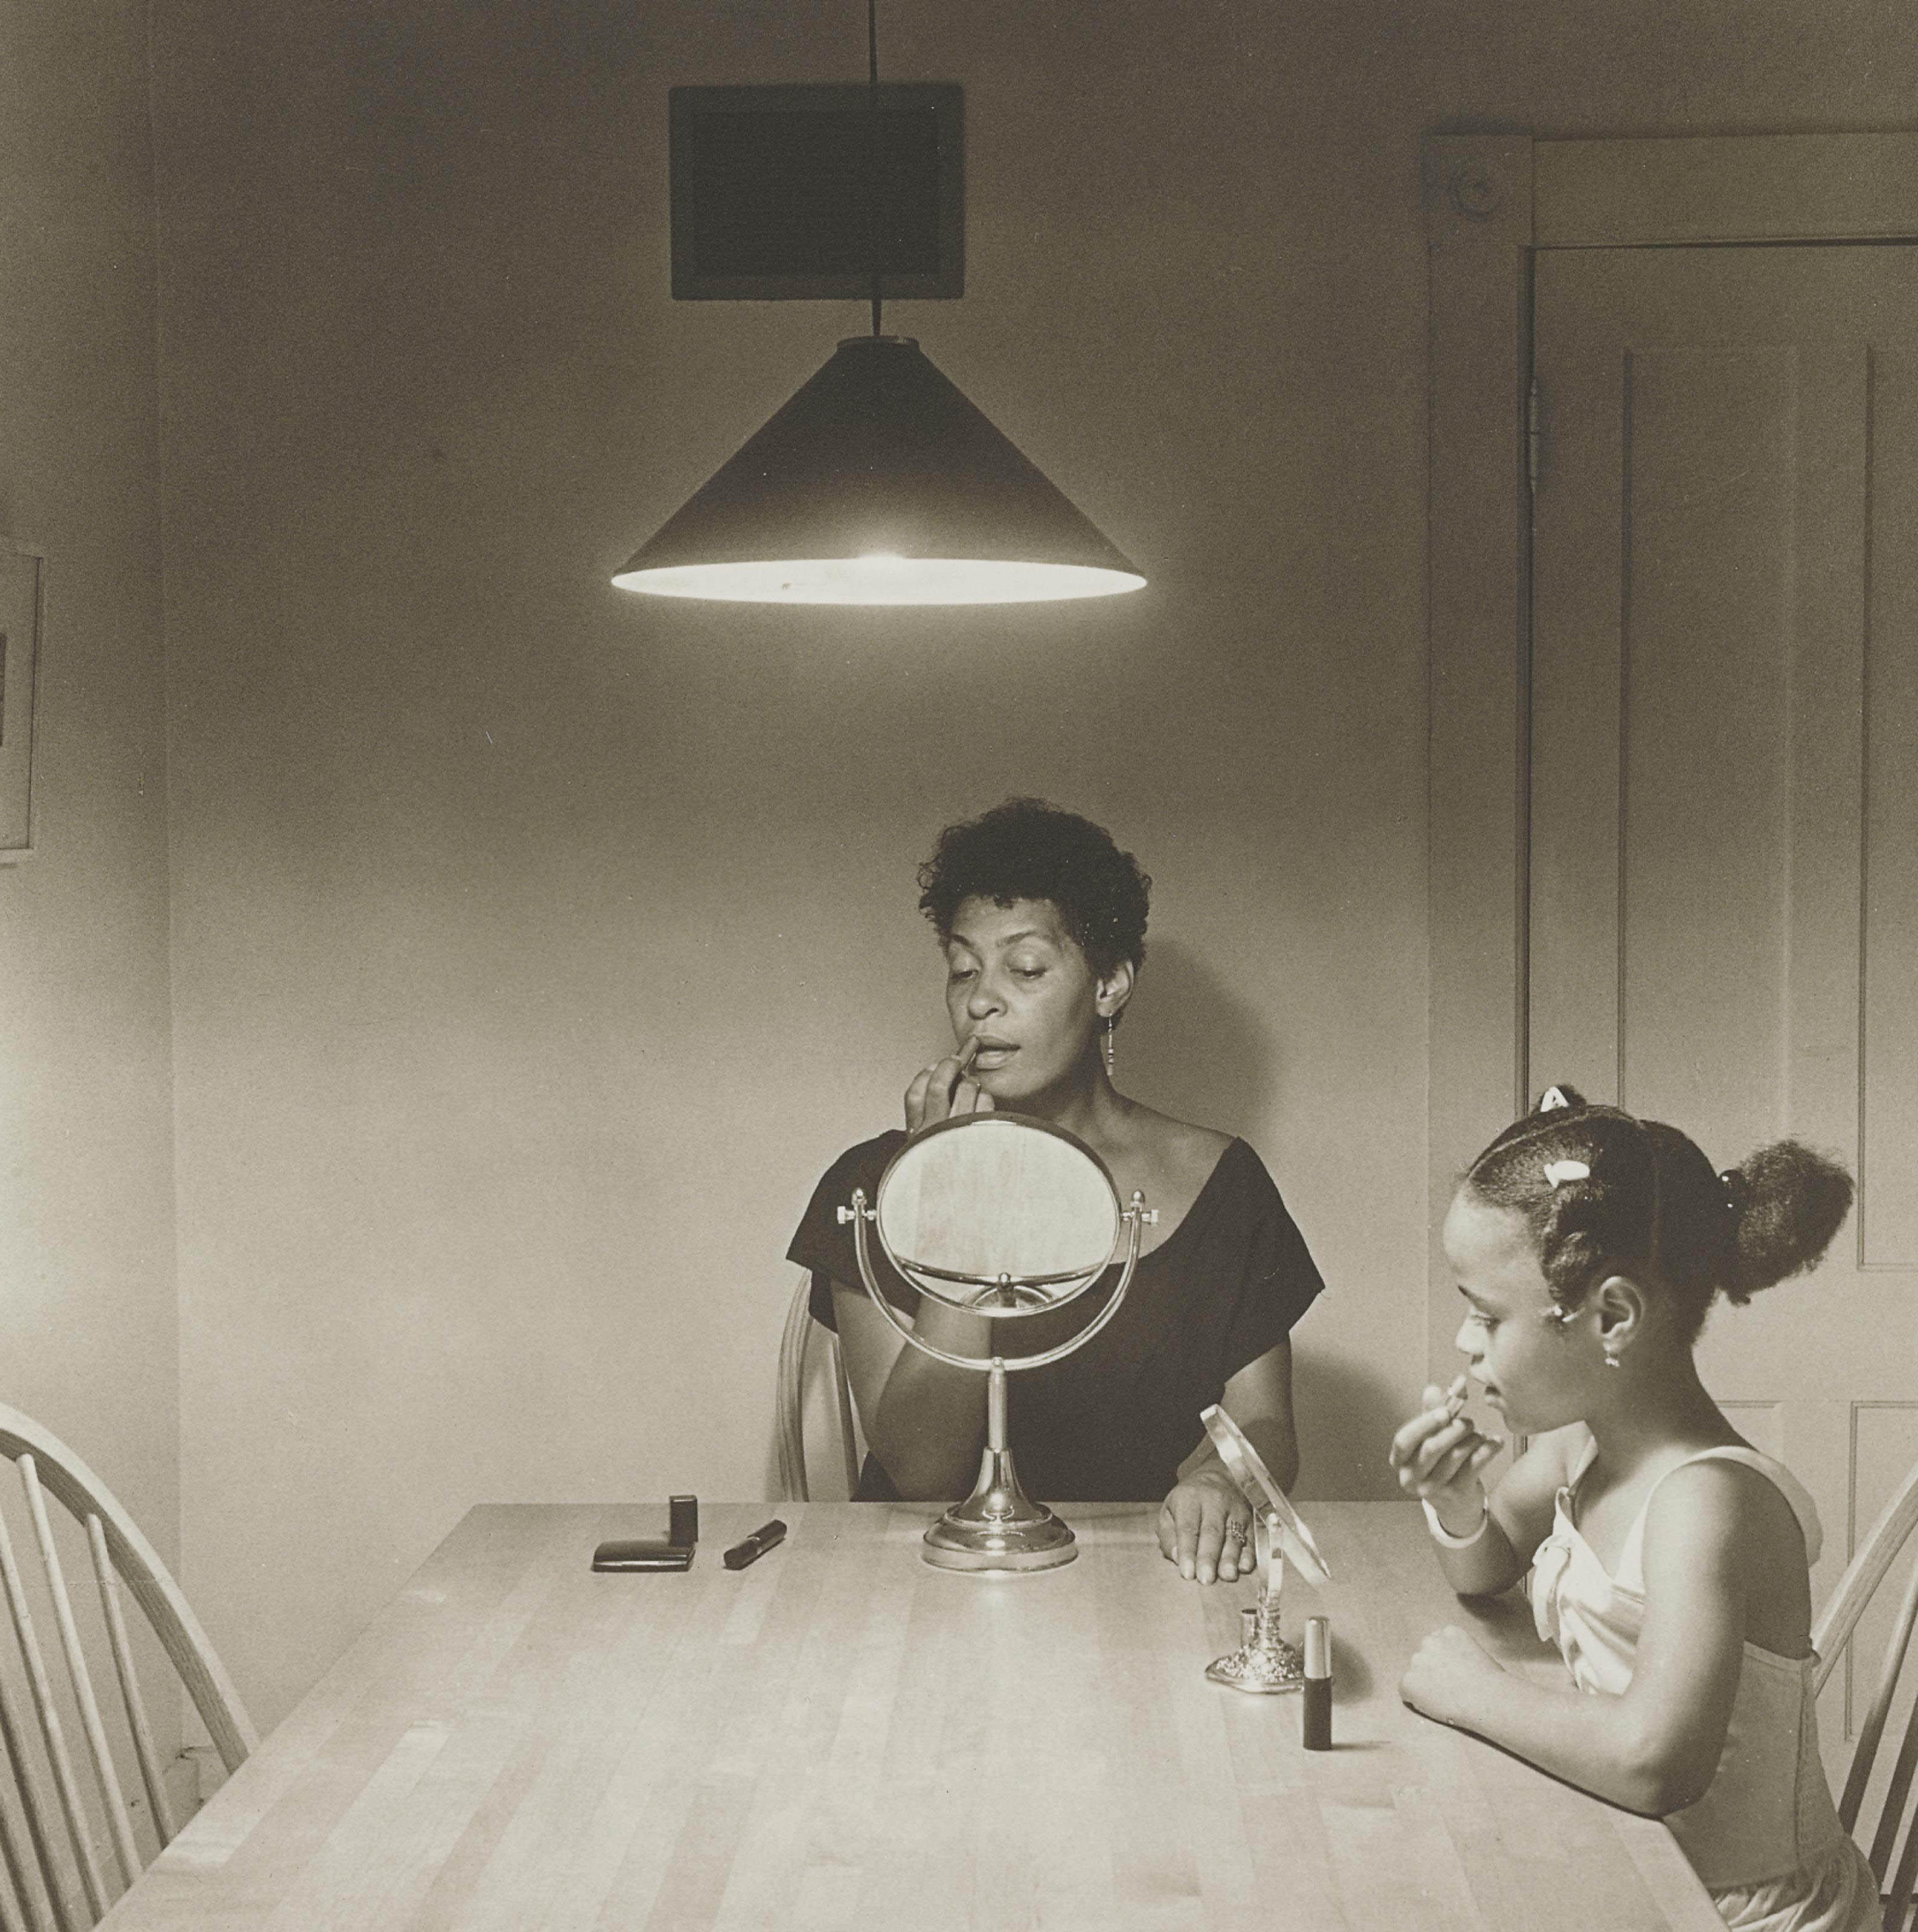 CARRIE MAE WEEMS (B. 1953)